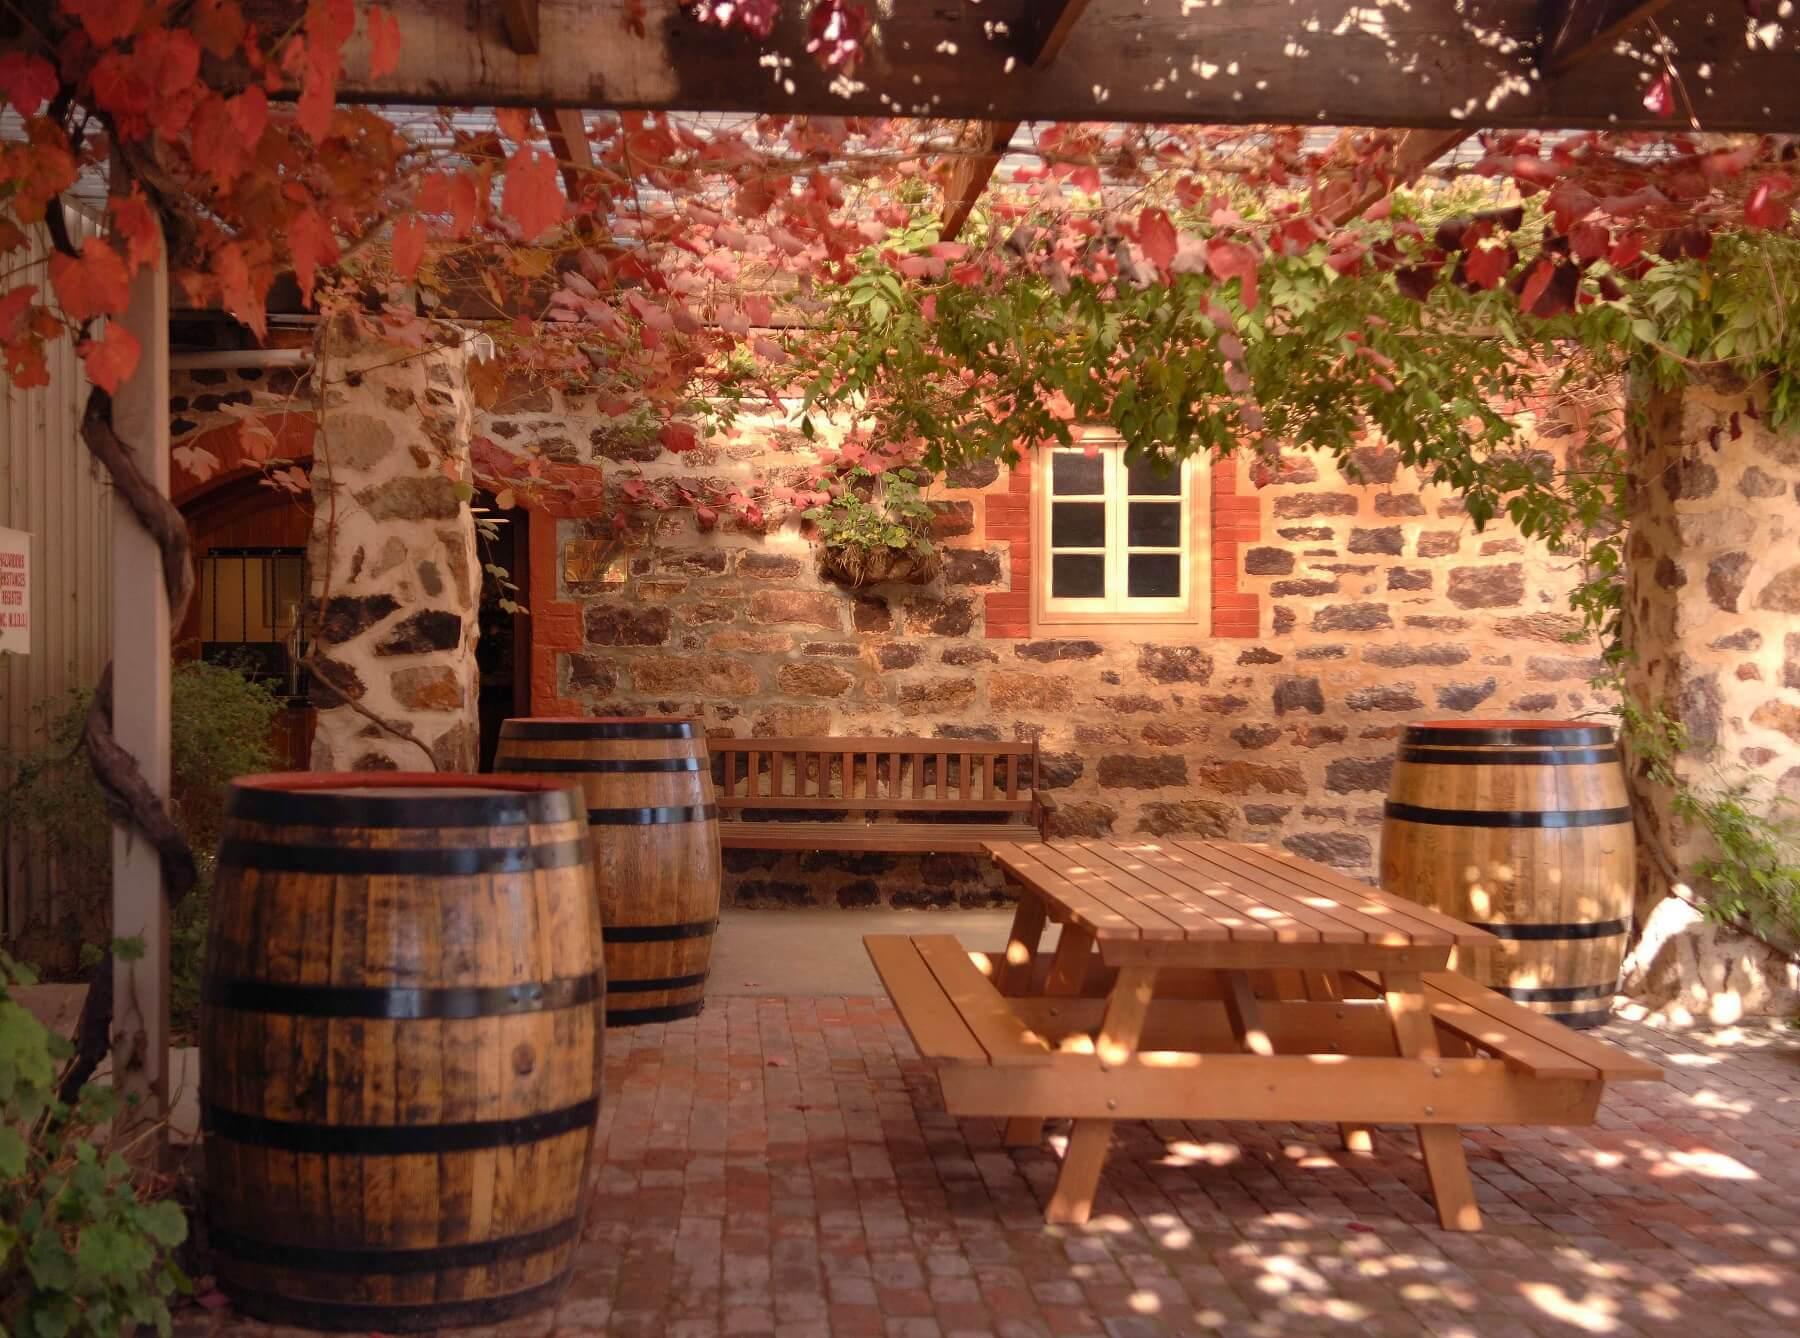 atdw-langmeil-winery-56ea0e2314d961623054c1e5--1-